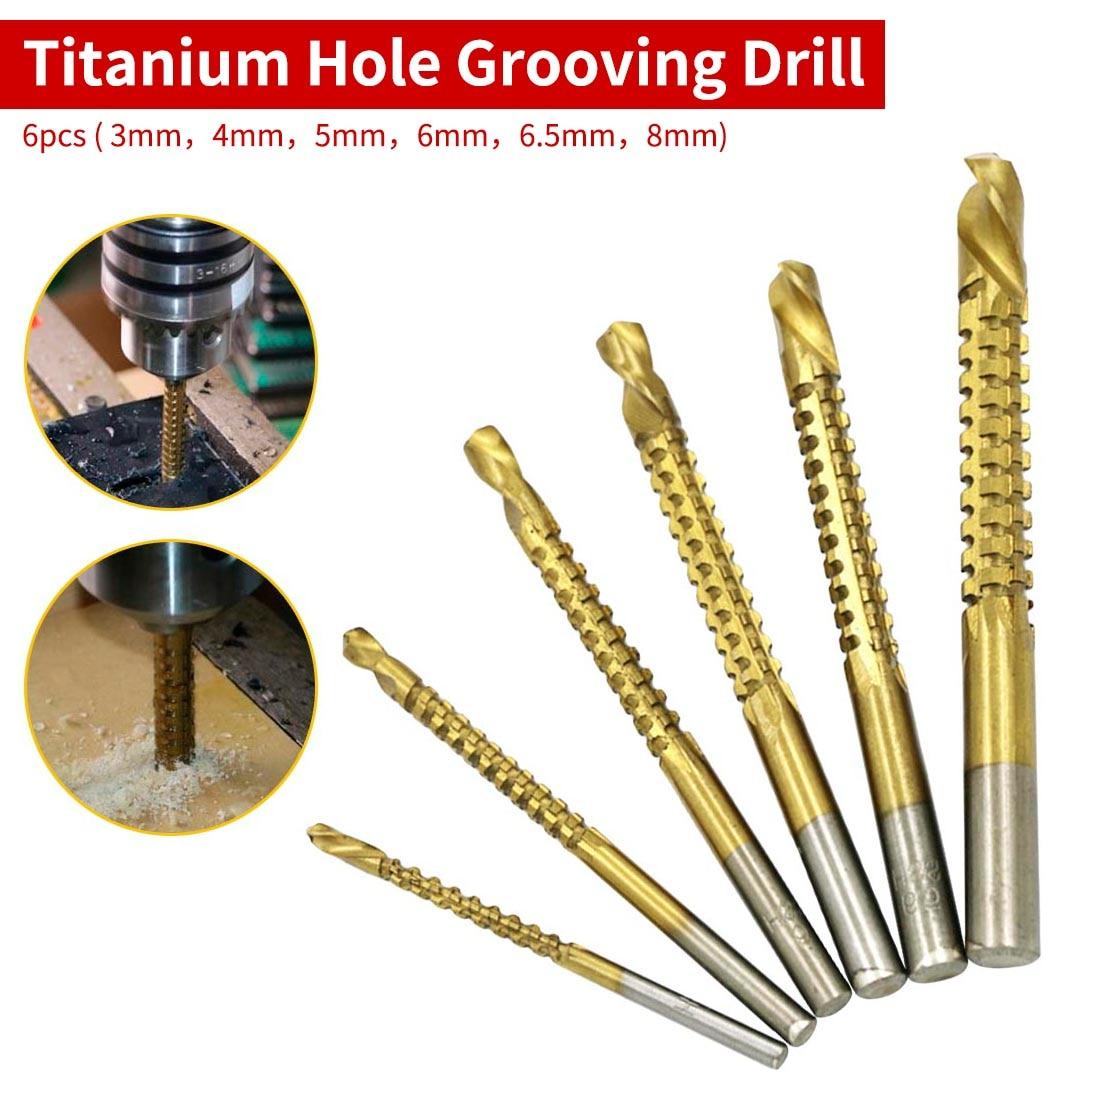 6pcs Hole Grooving Drill Bit Saw Carpenter Tool Titanium Coated HSS For Plastic Wood Woodworking Tool 3mm 4mm 5mm 6mm 6.5mm 8mm